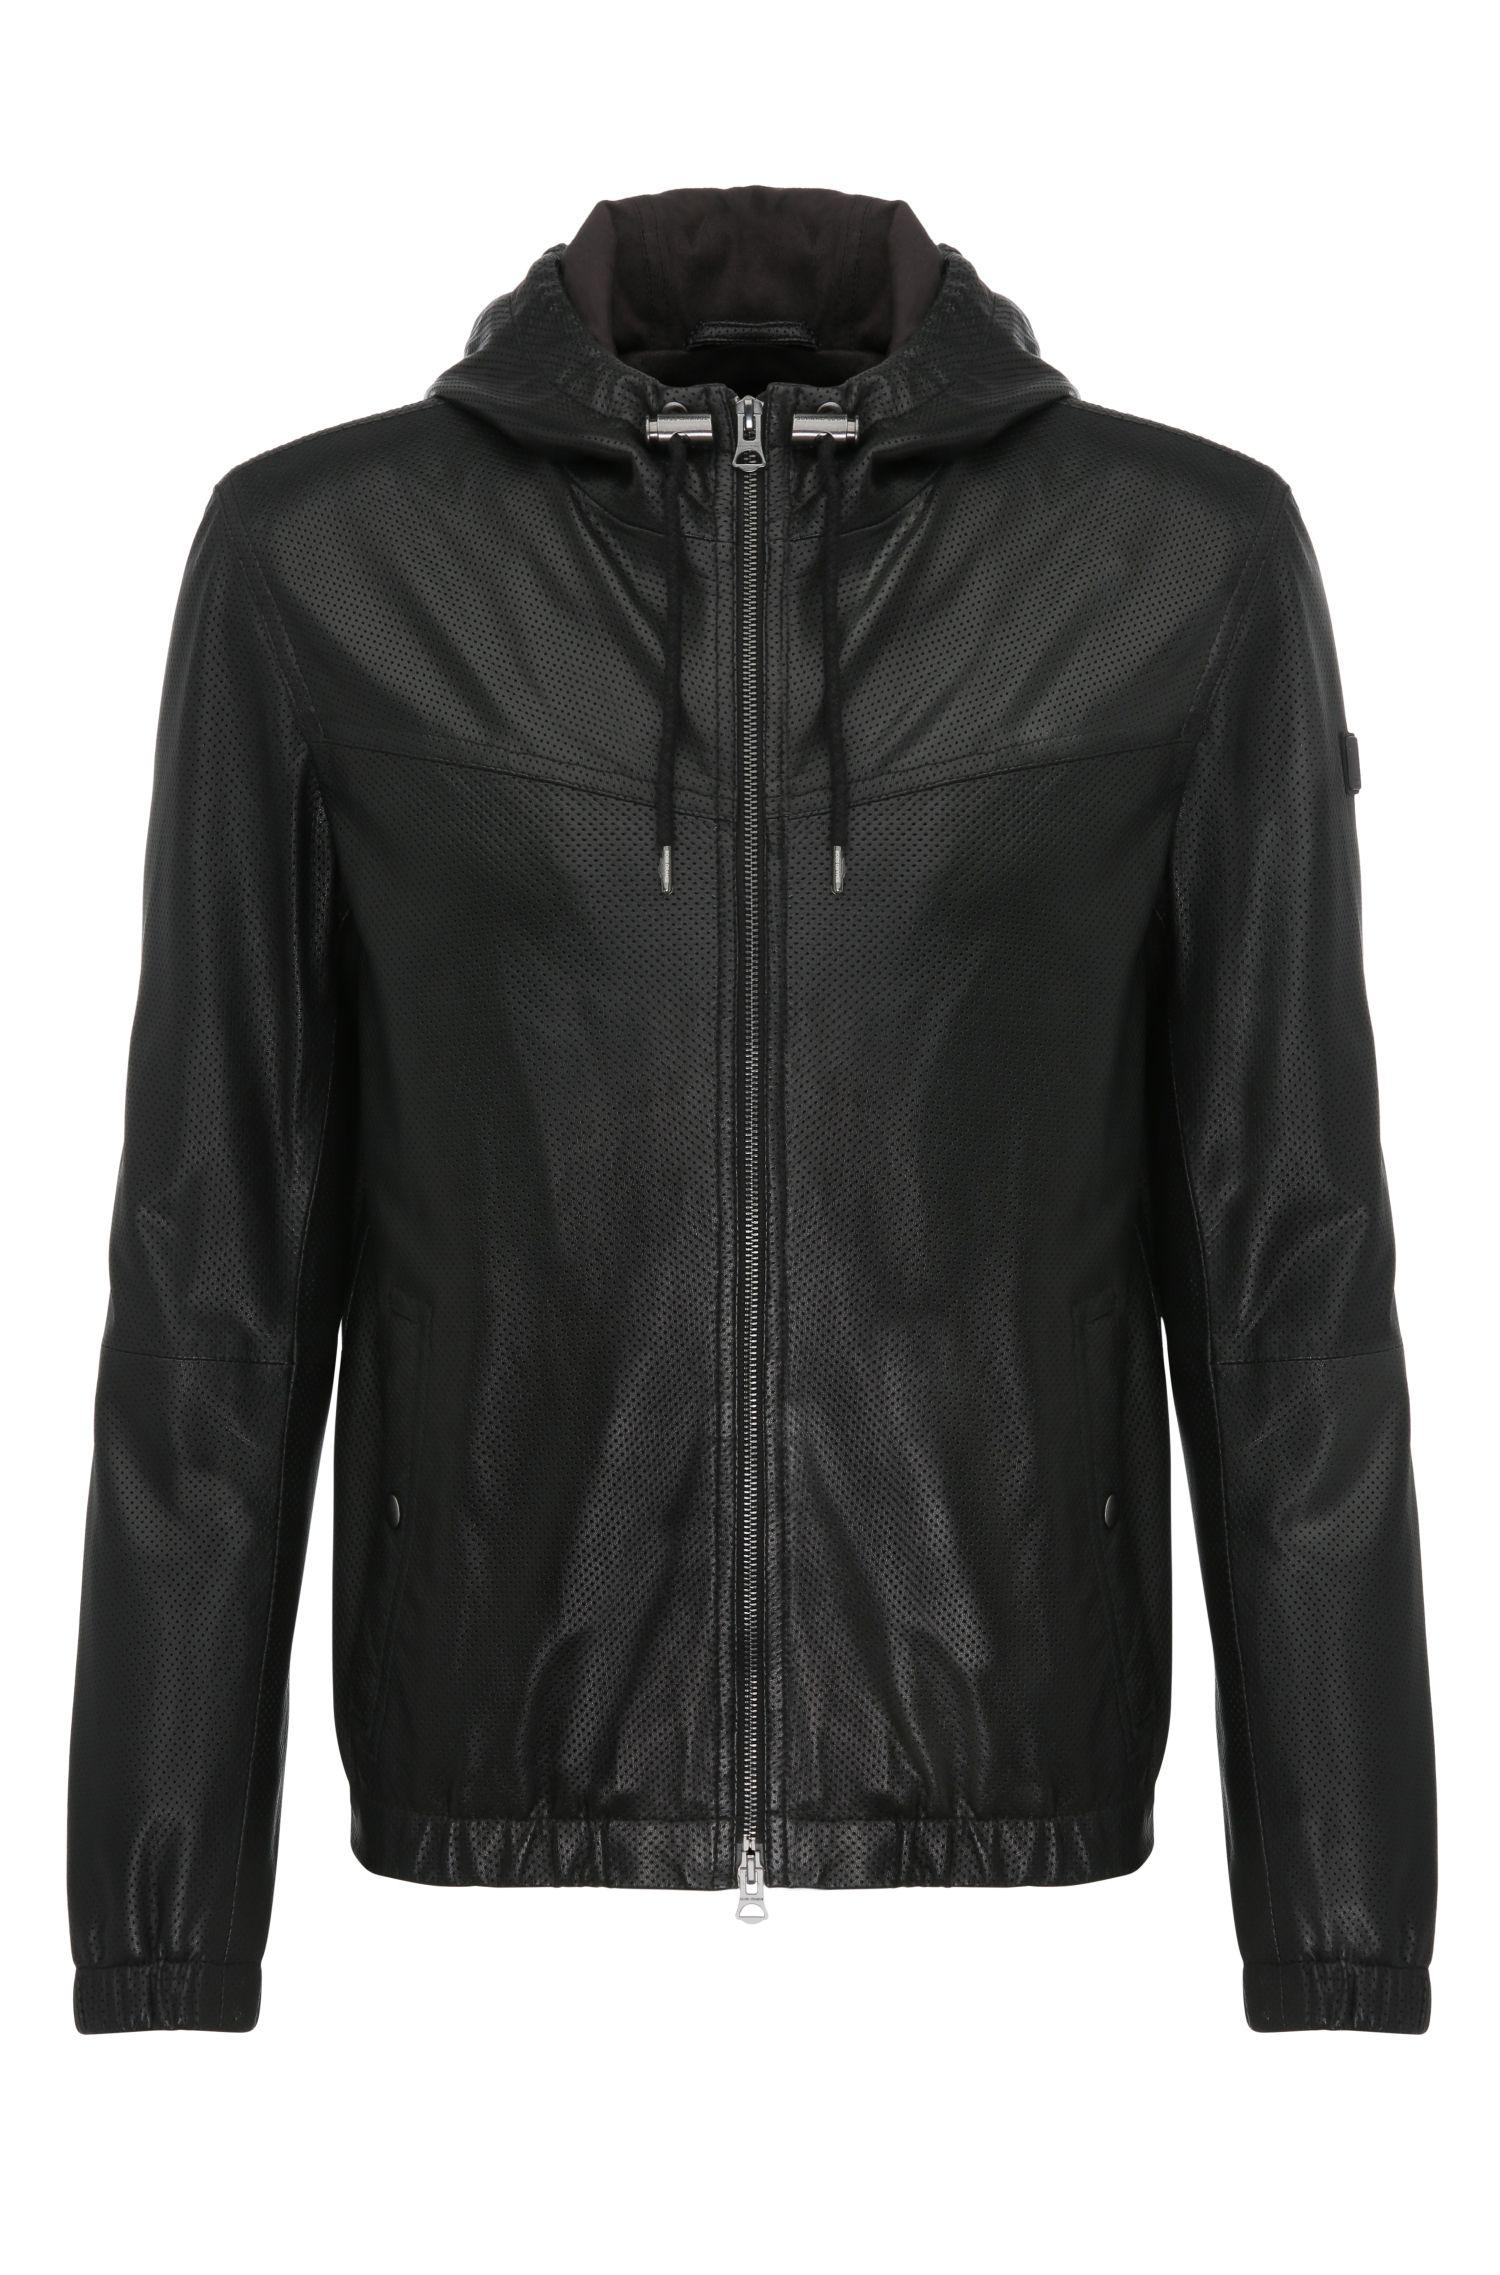 'Jainee' | Lambskin Perforated Hooded Blouson Jacket